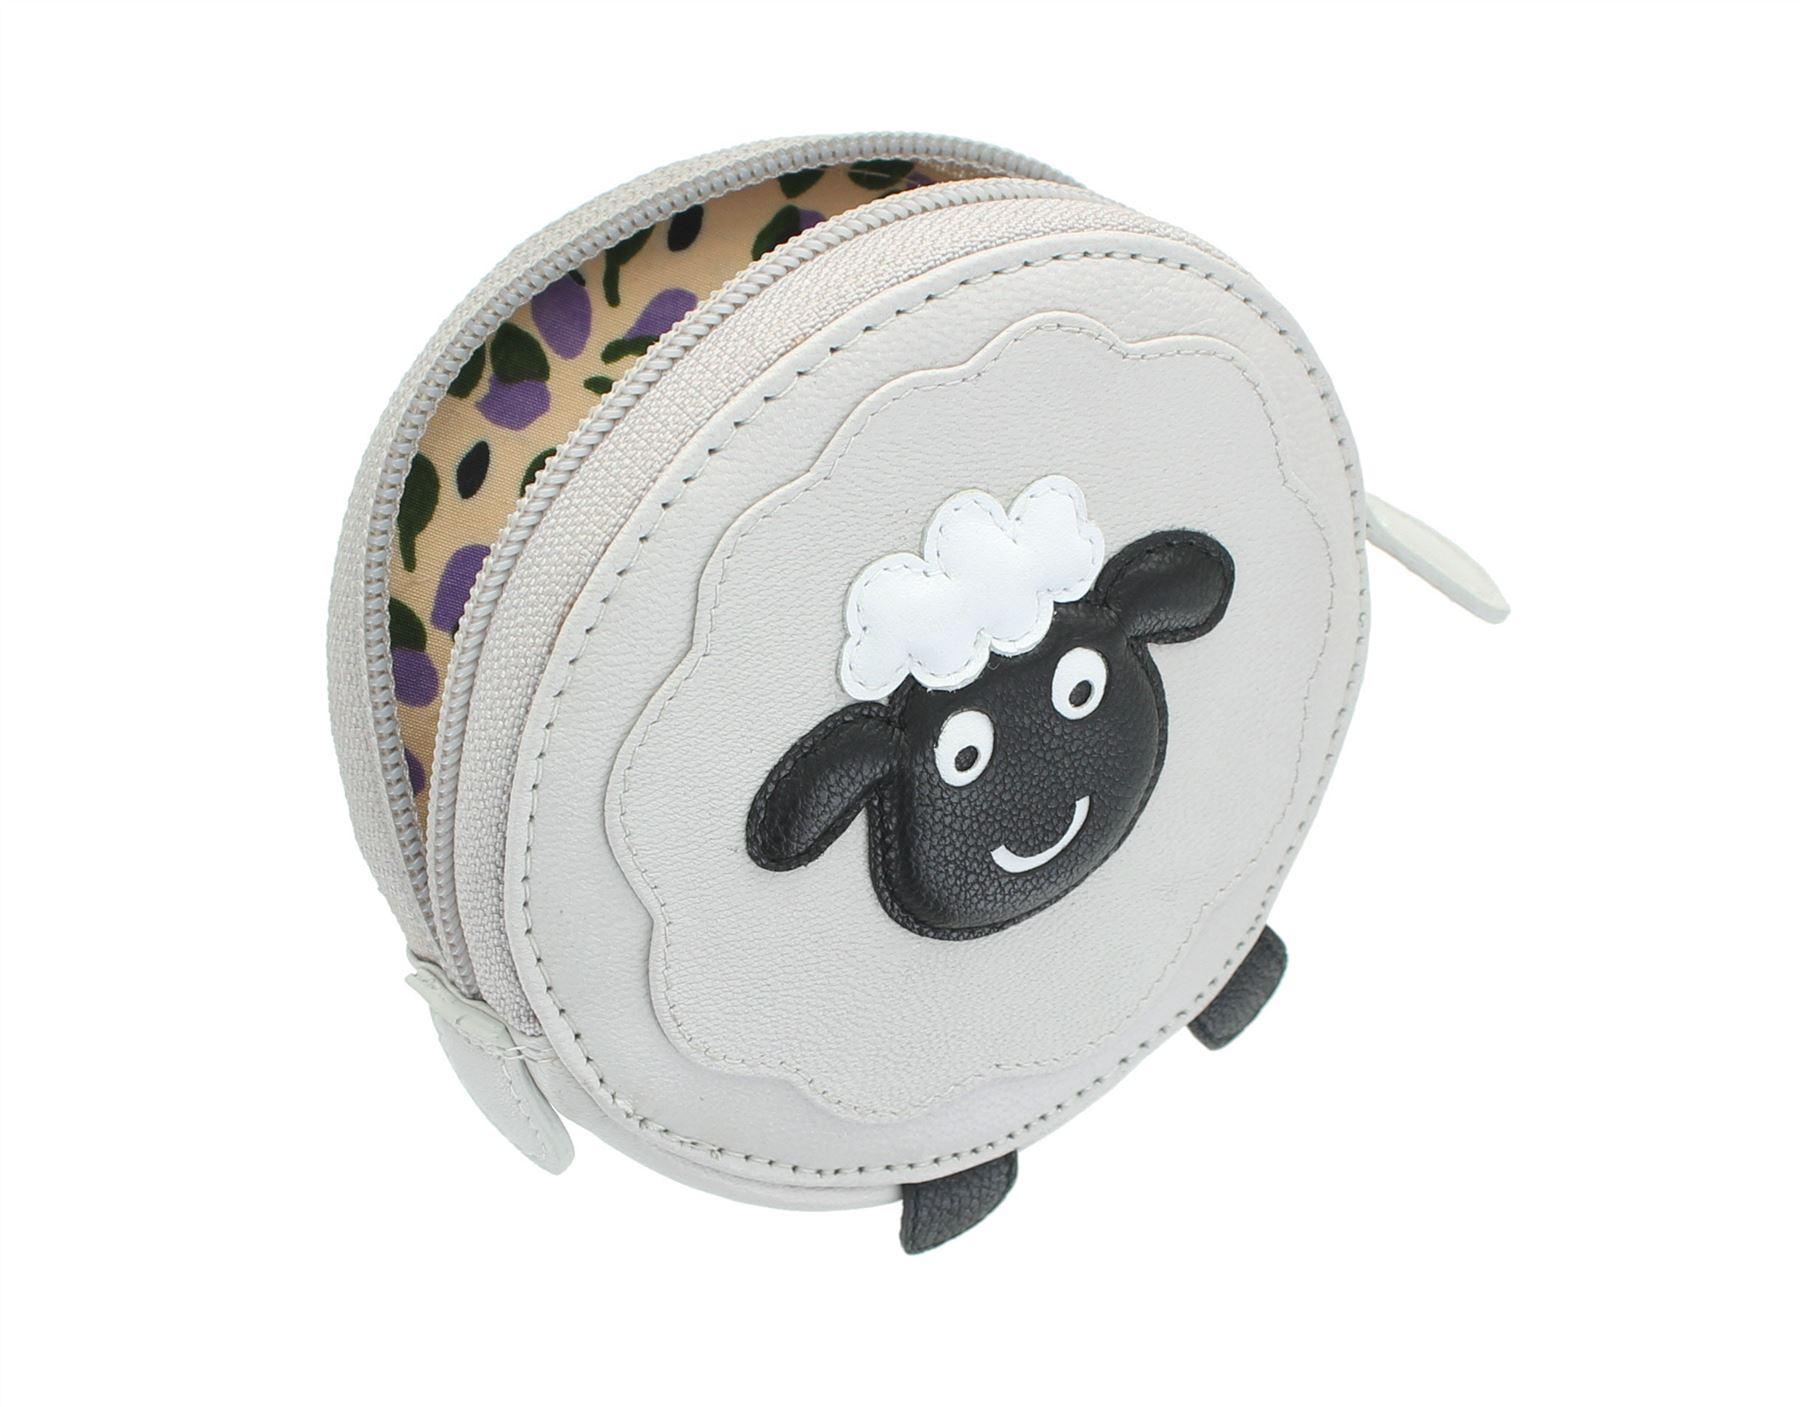 Mala Leather Animal Design Round Leather Coin Purse 4155/_11